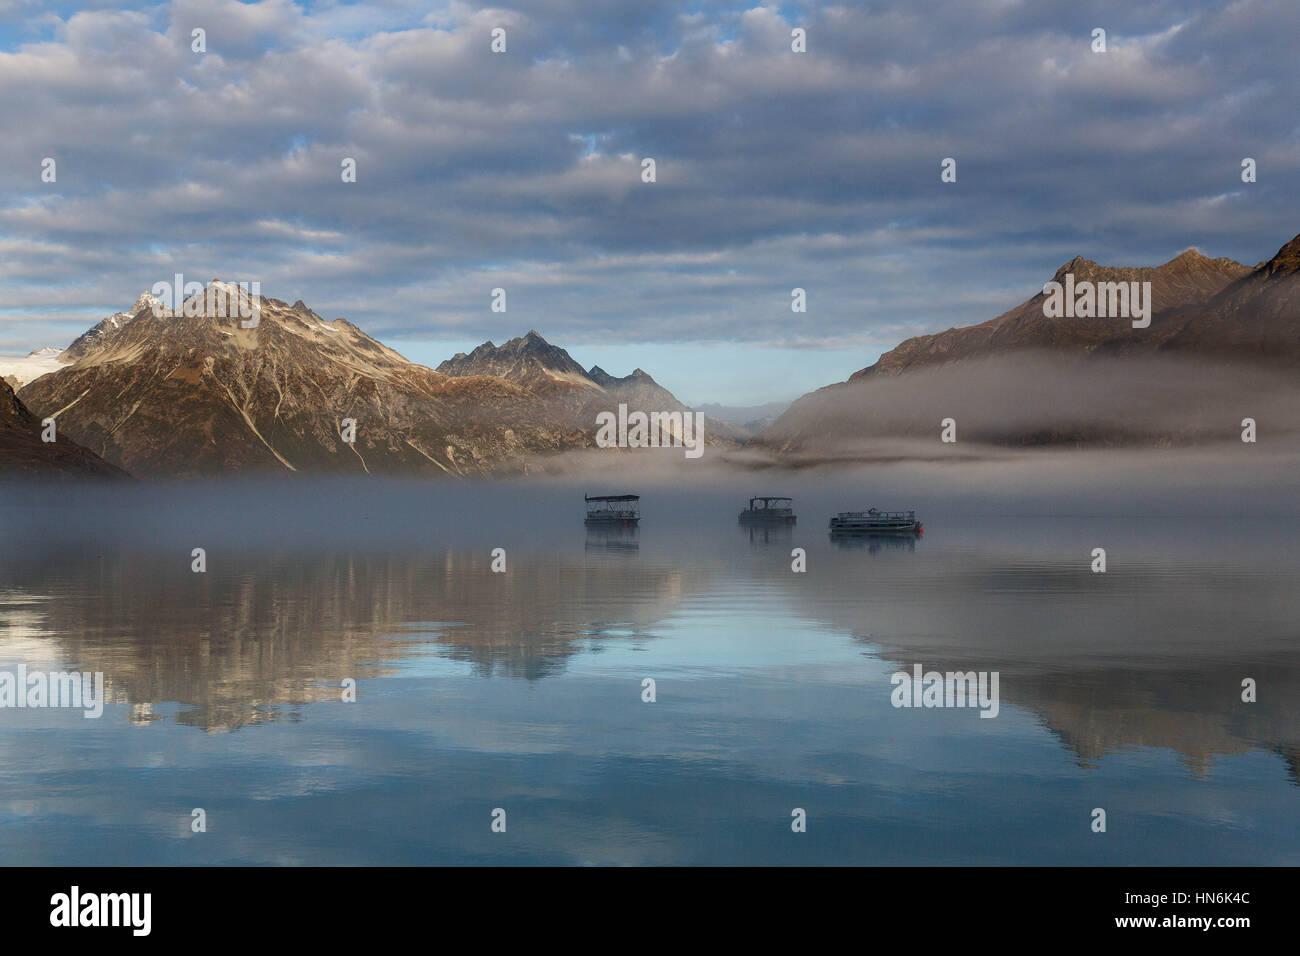 Three boats on a calm morning on Crescent Lake near Mount Redoubt, Lake Clark National Park, Alaska, USA - Stock Image